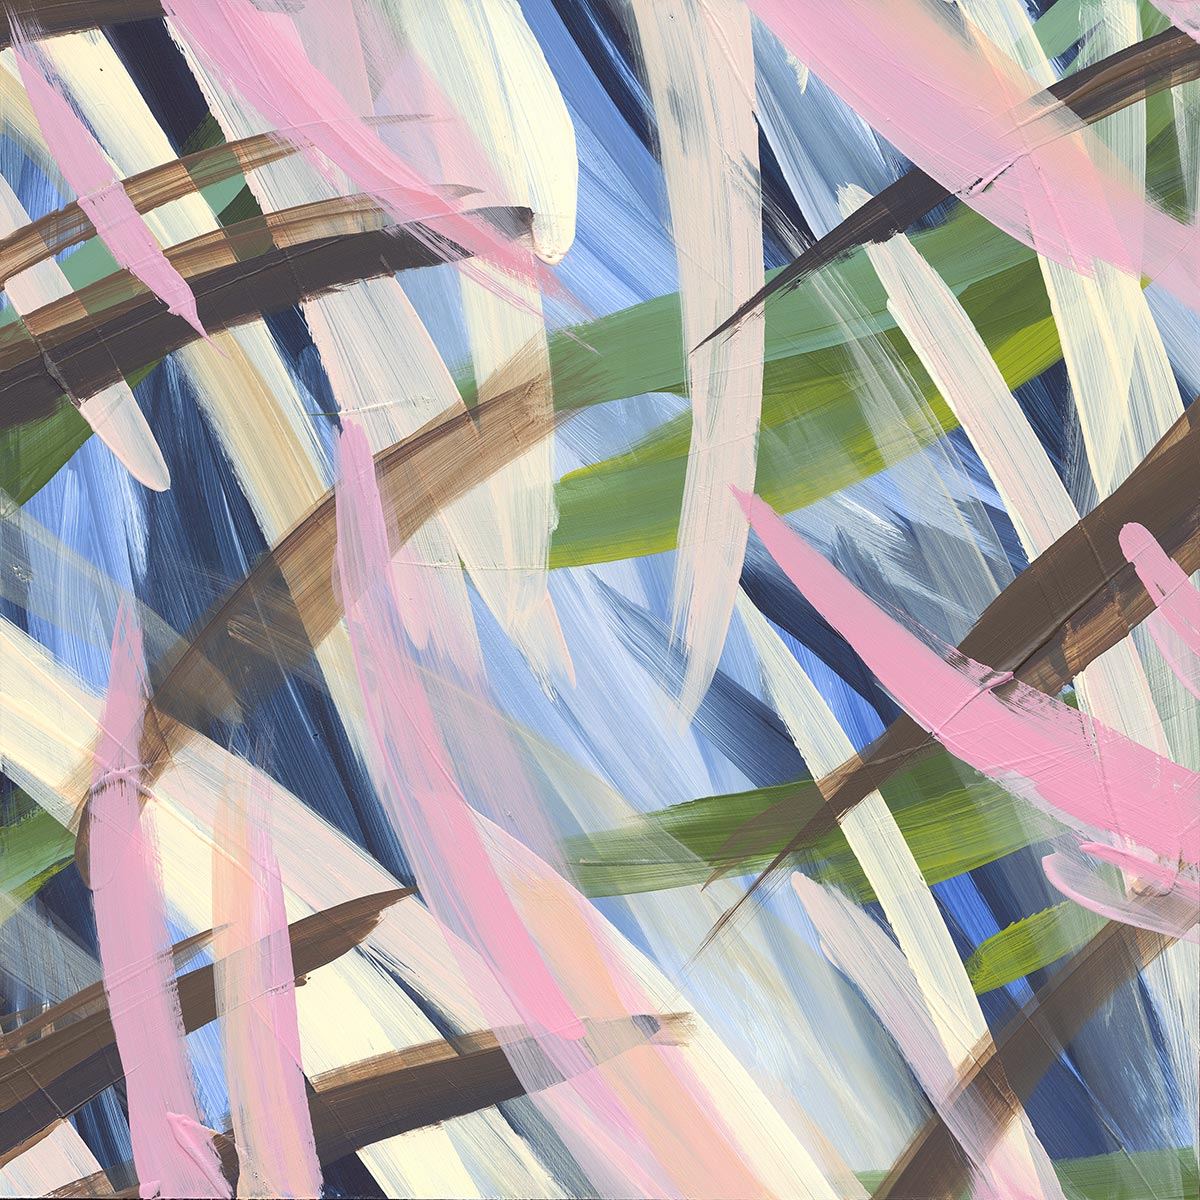 Continuous Painting 8 - Lori Dorfman